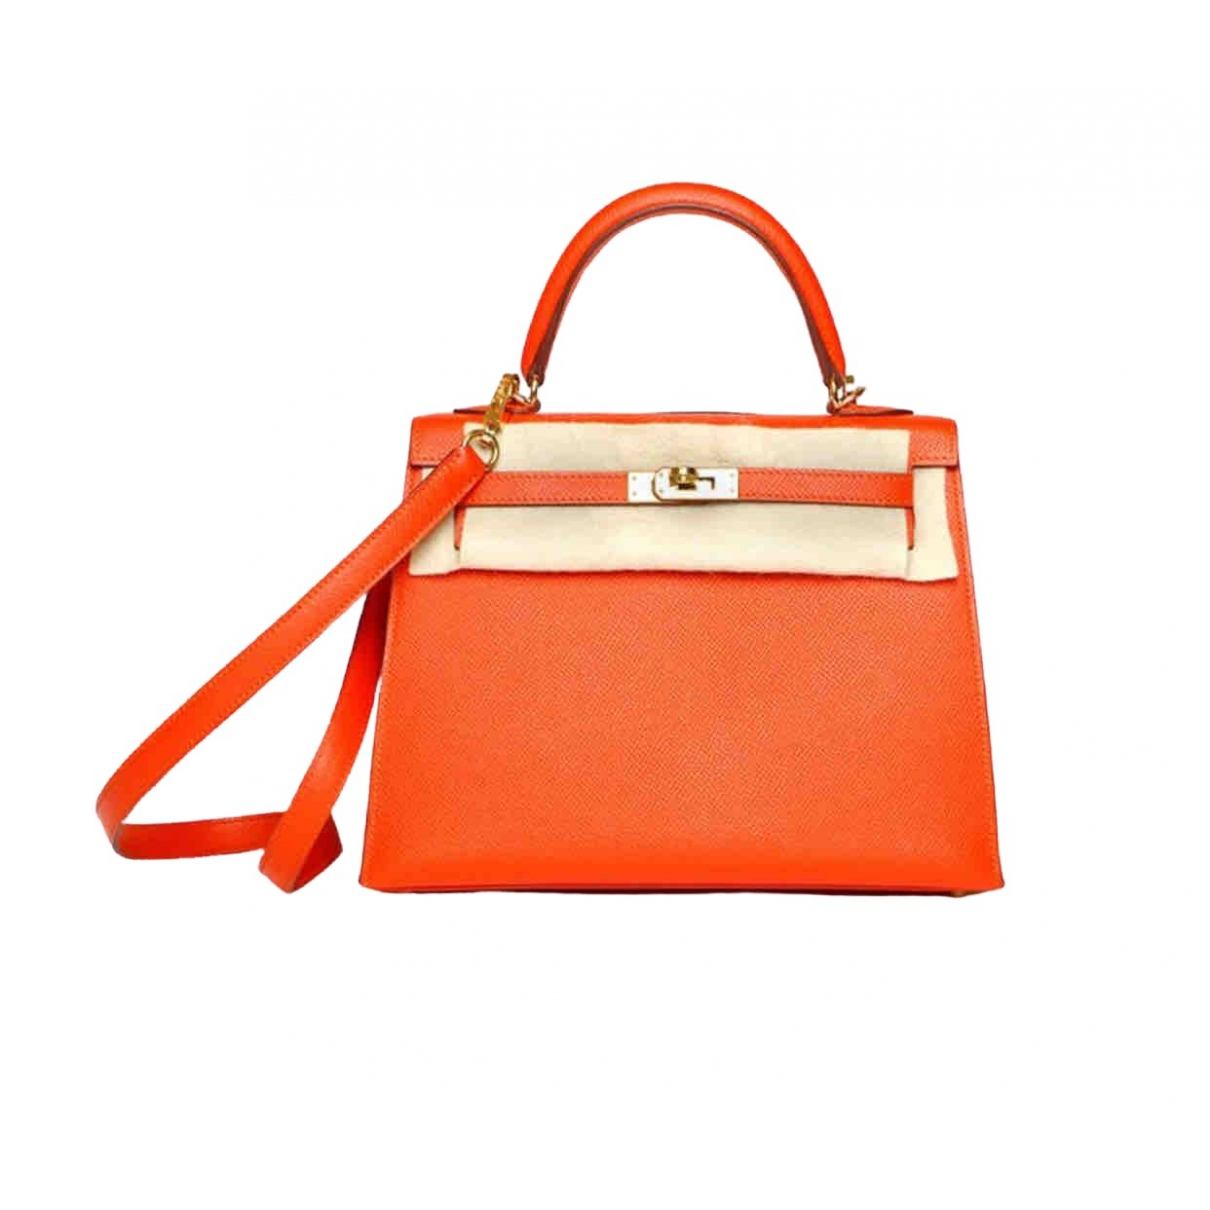 Hermes - Sac a main Kelly 25 pour femme en cuir - orange